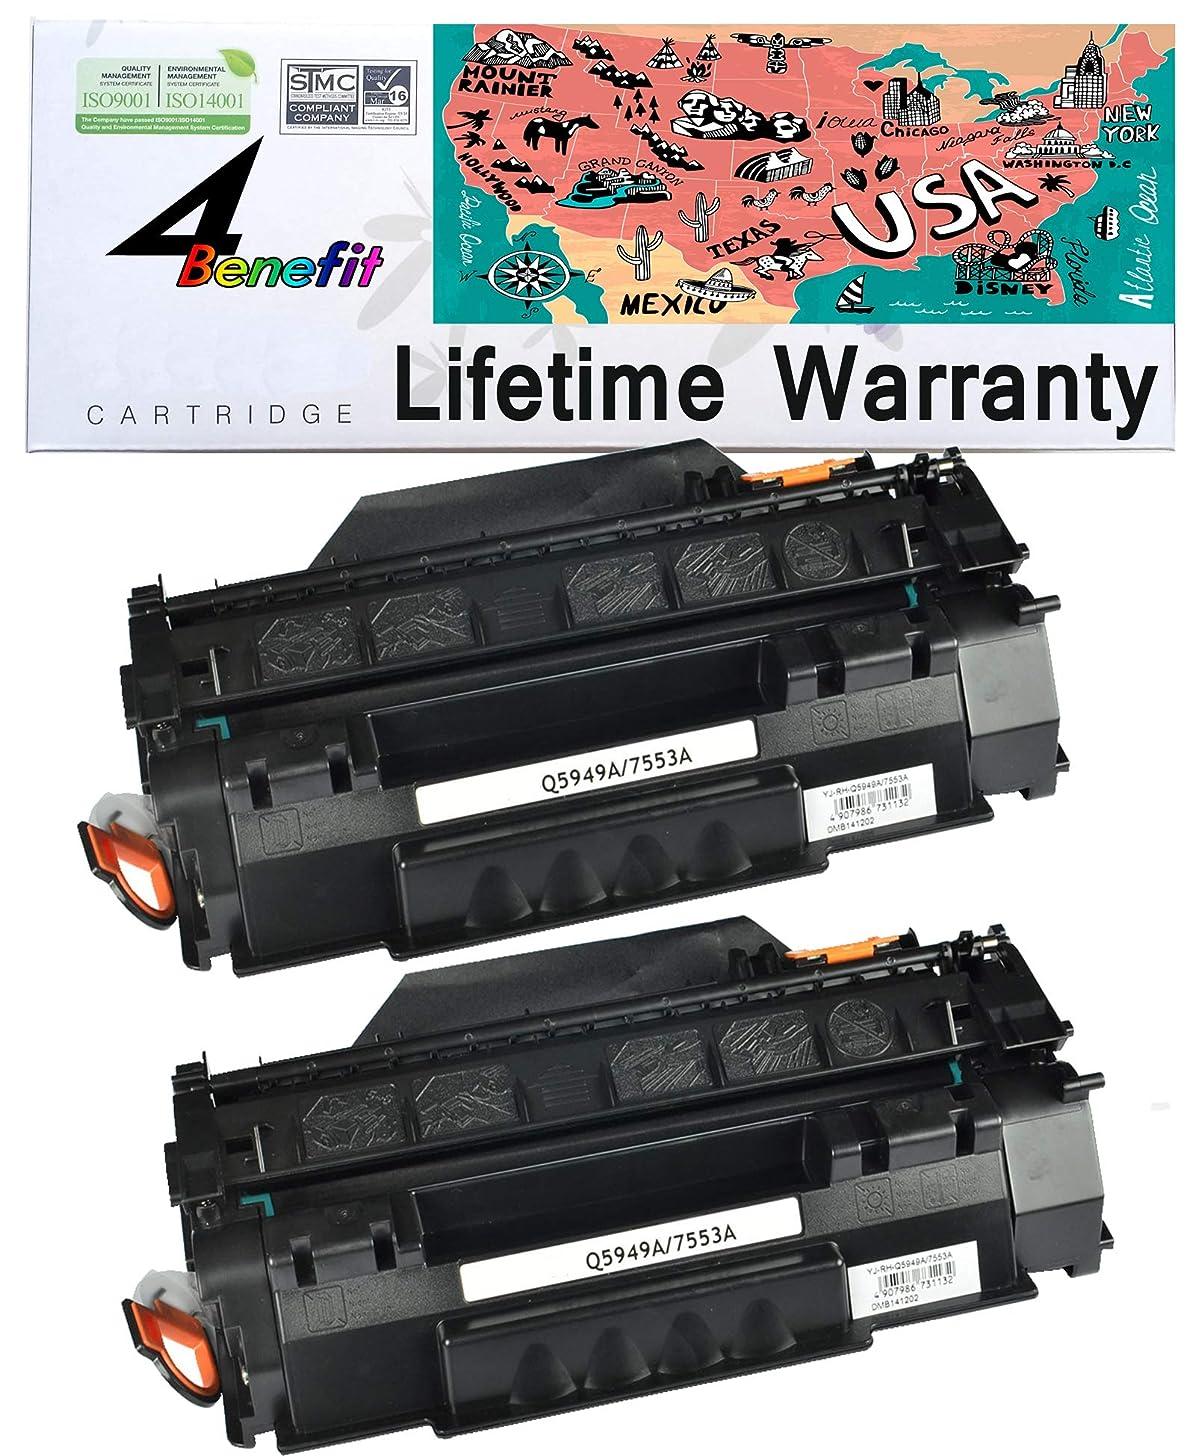 4Benefit Compatible Toner Cartridge Replacement for HP Q7553A HP 53A Toner HP Q5949A HP 49A Black 2 Pack